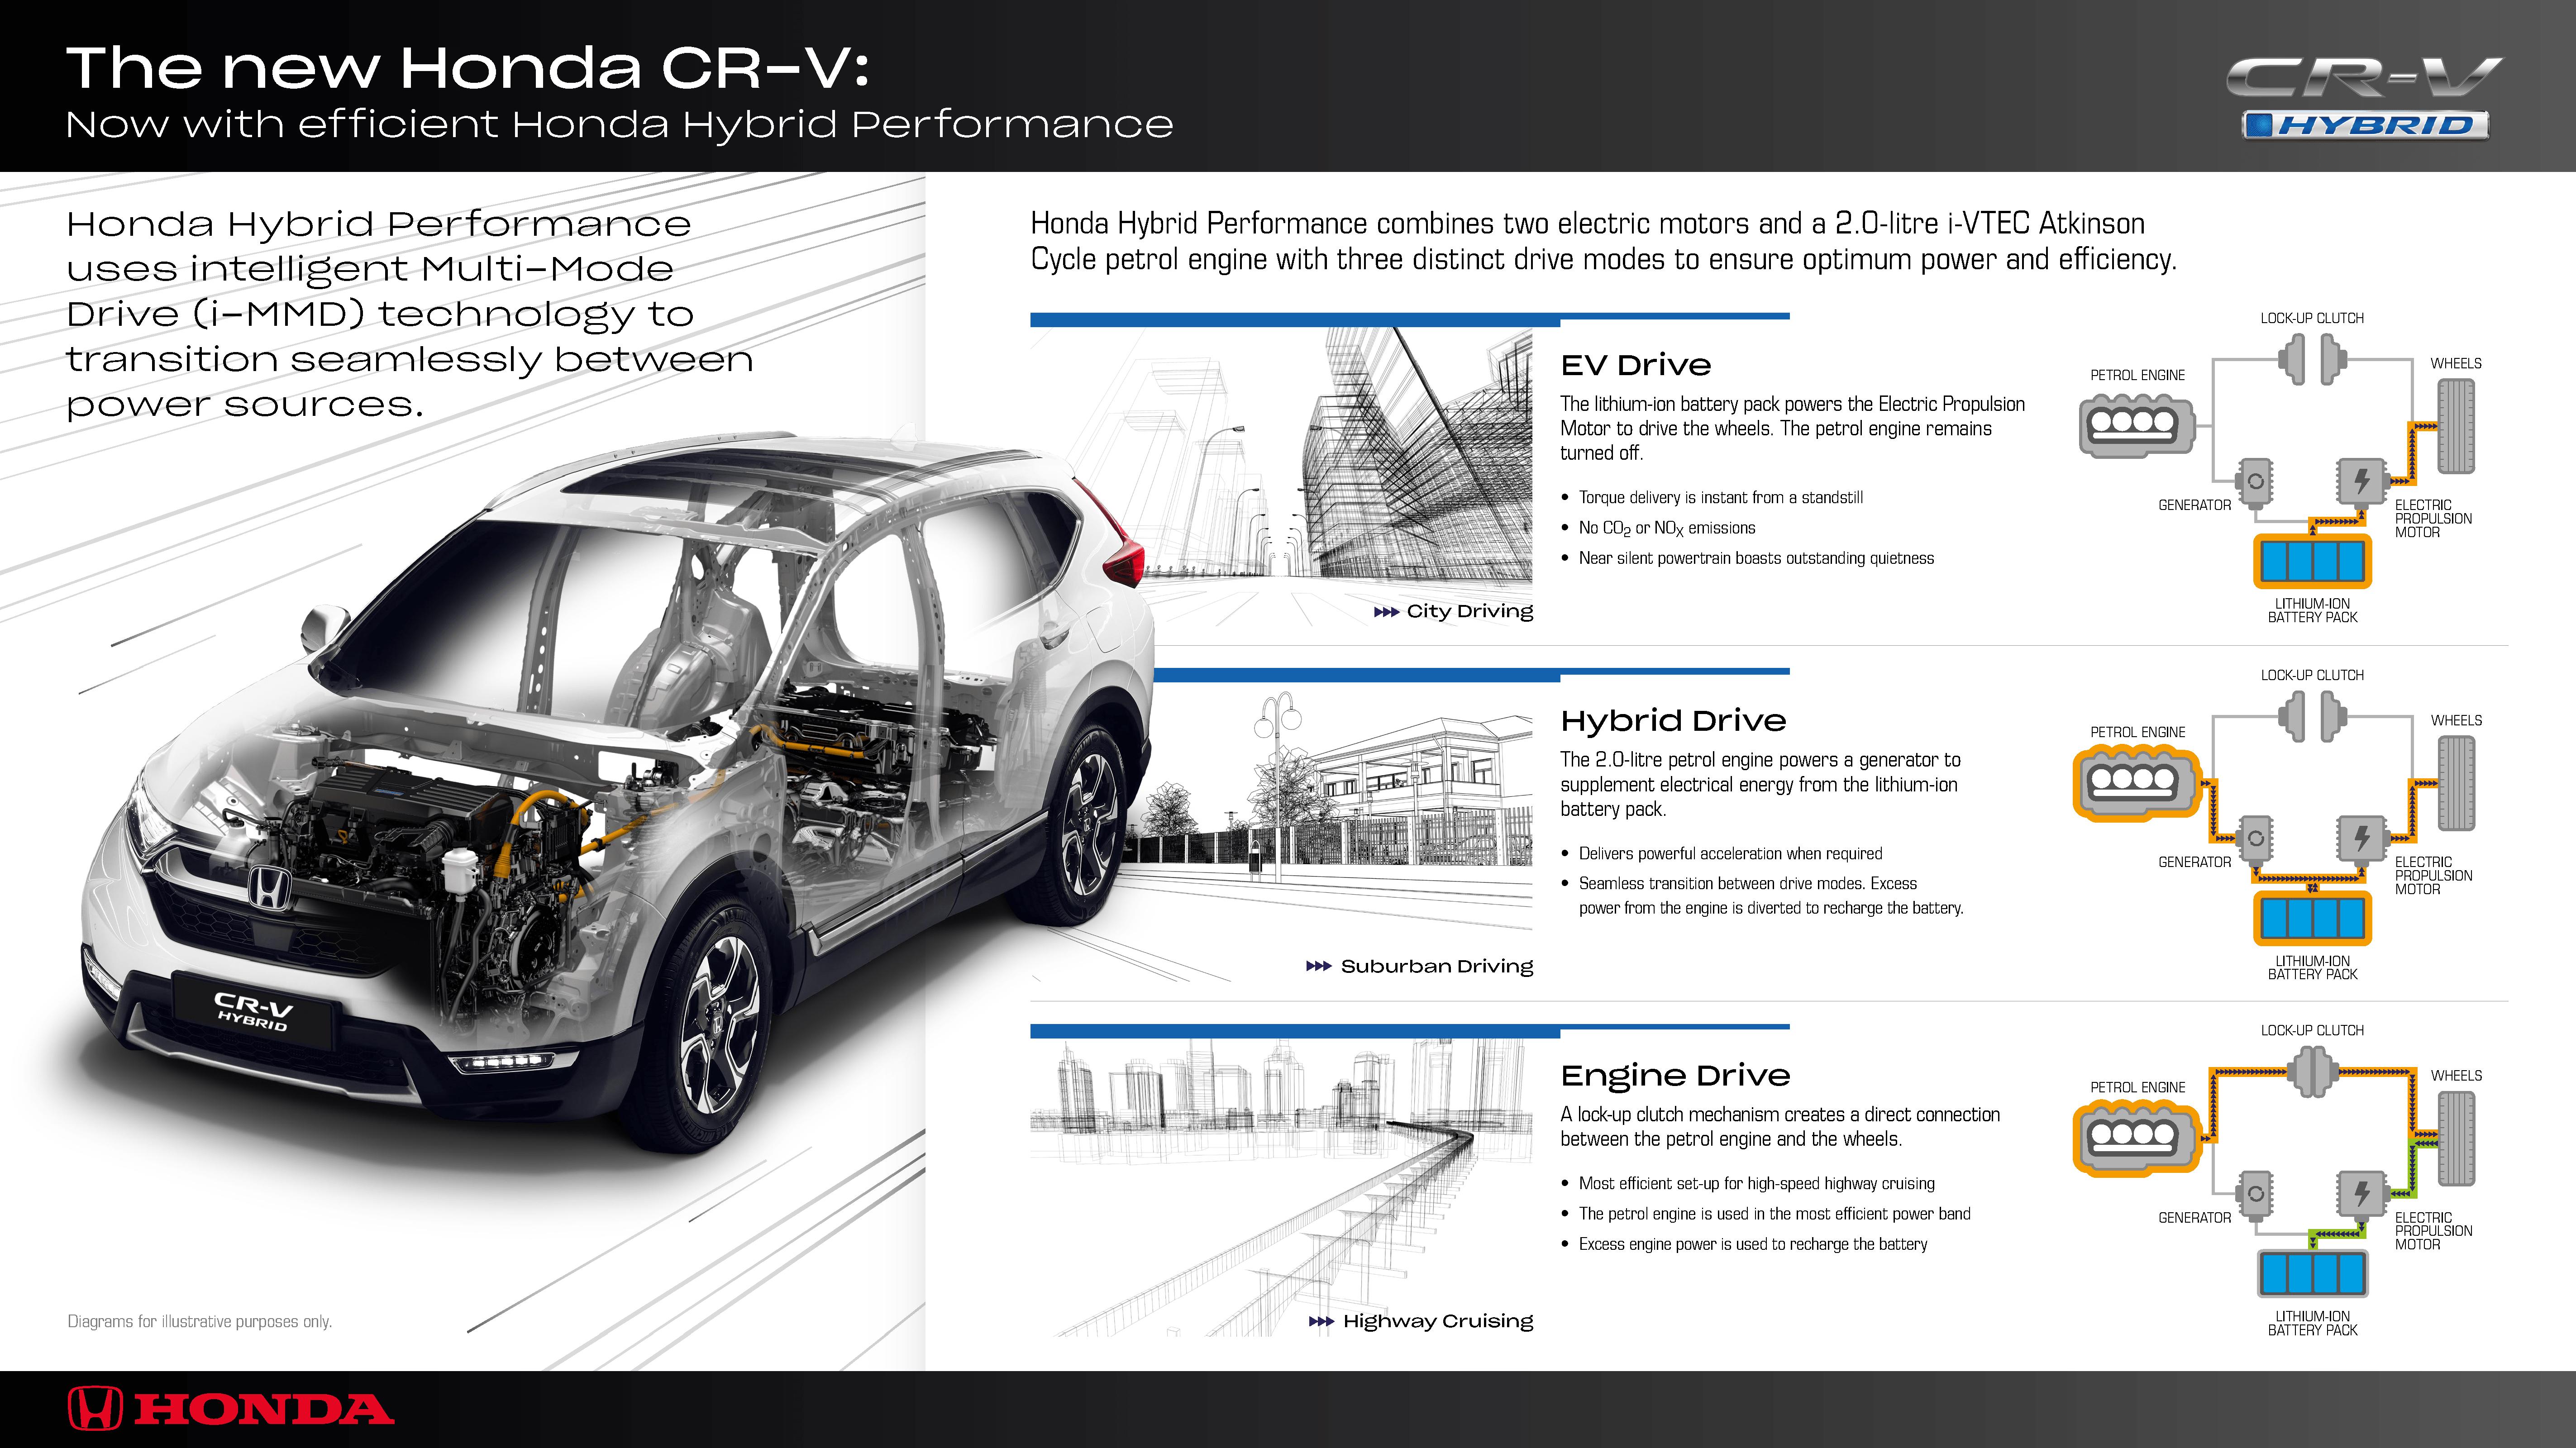 Noi standarde de performanta cu Honda CR-V hibrid